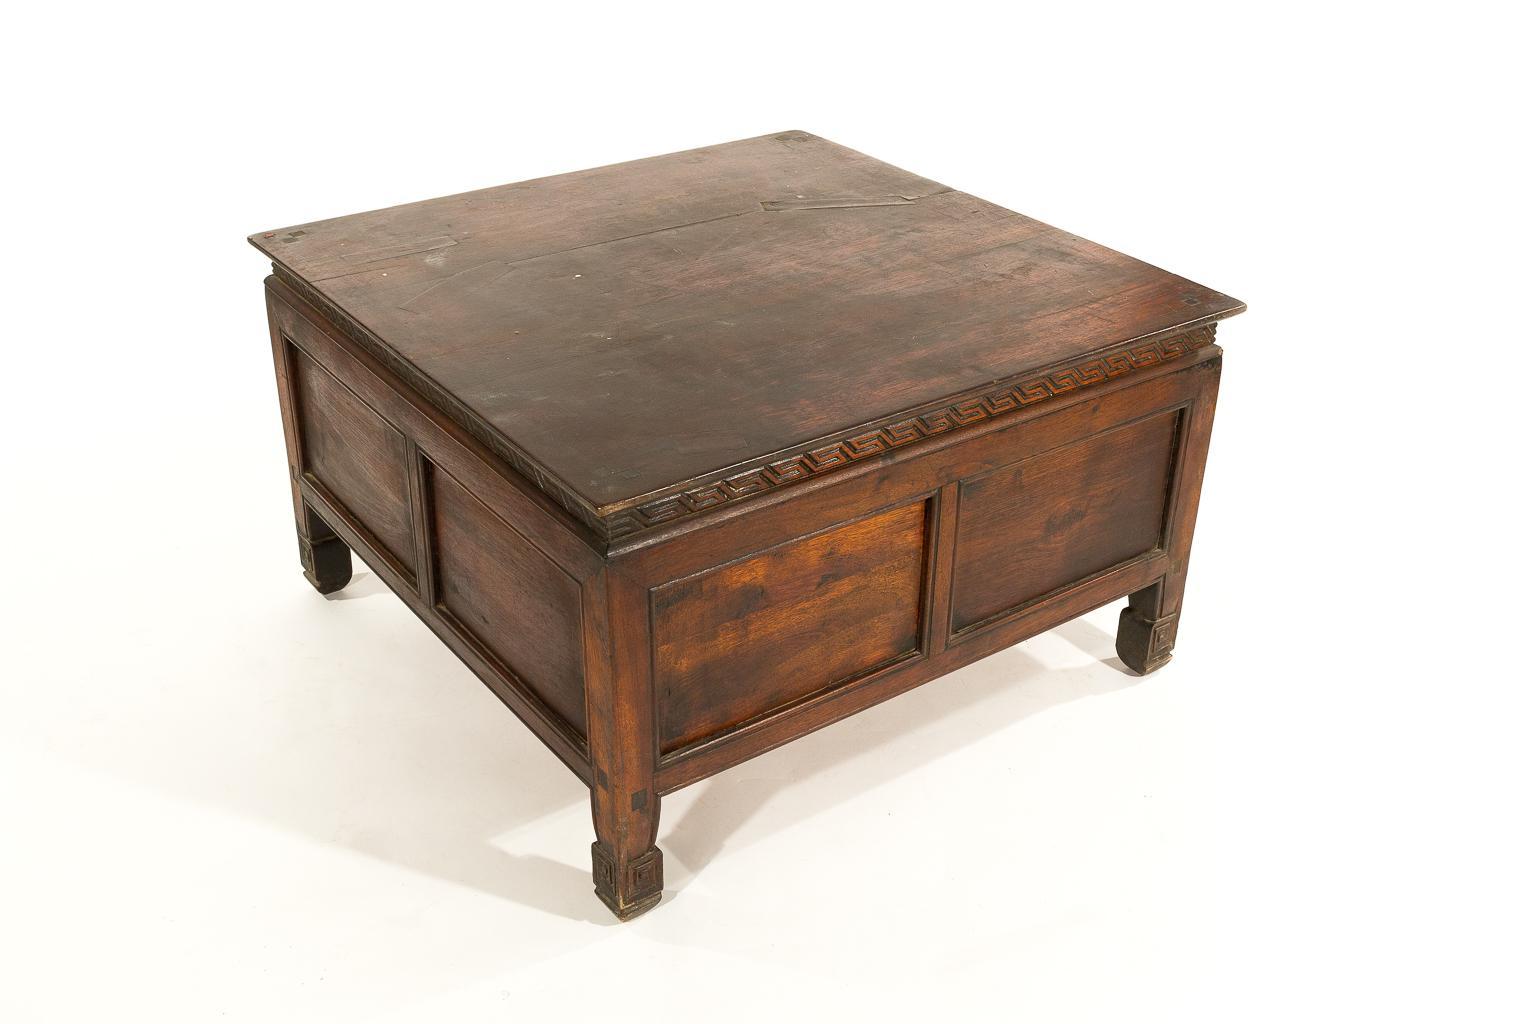 Antique Tibetan Square Tea Or Coffee Table With Storage